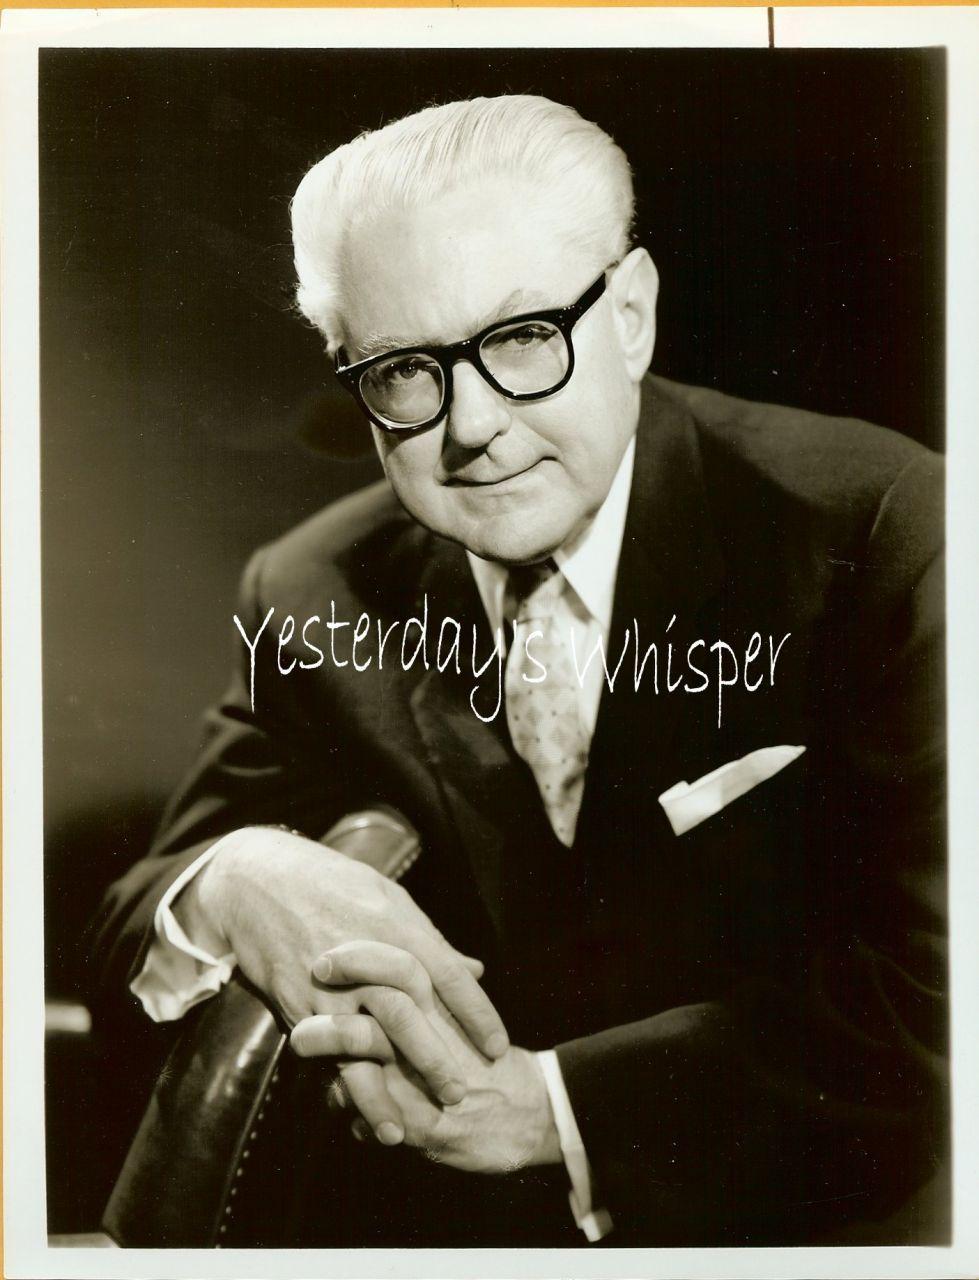 1950s TV Promo Photo Gershwin Conductor Donald Voorhees K478